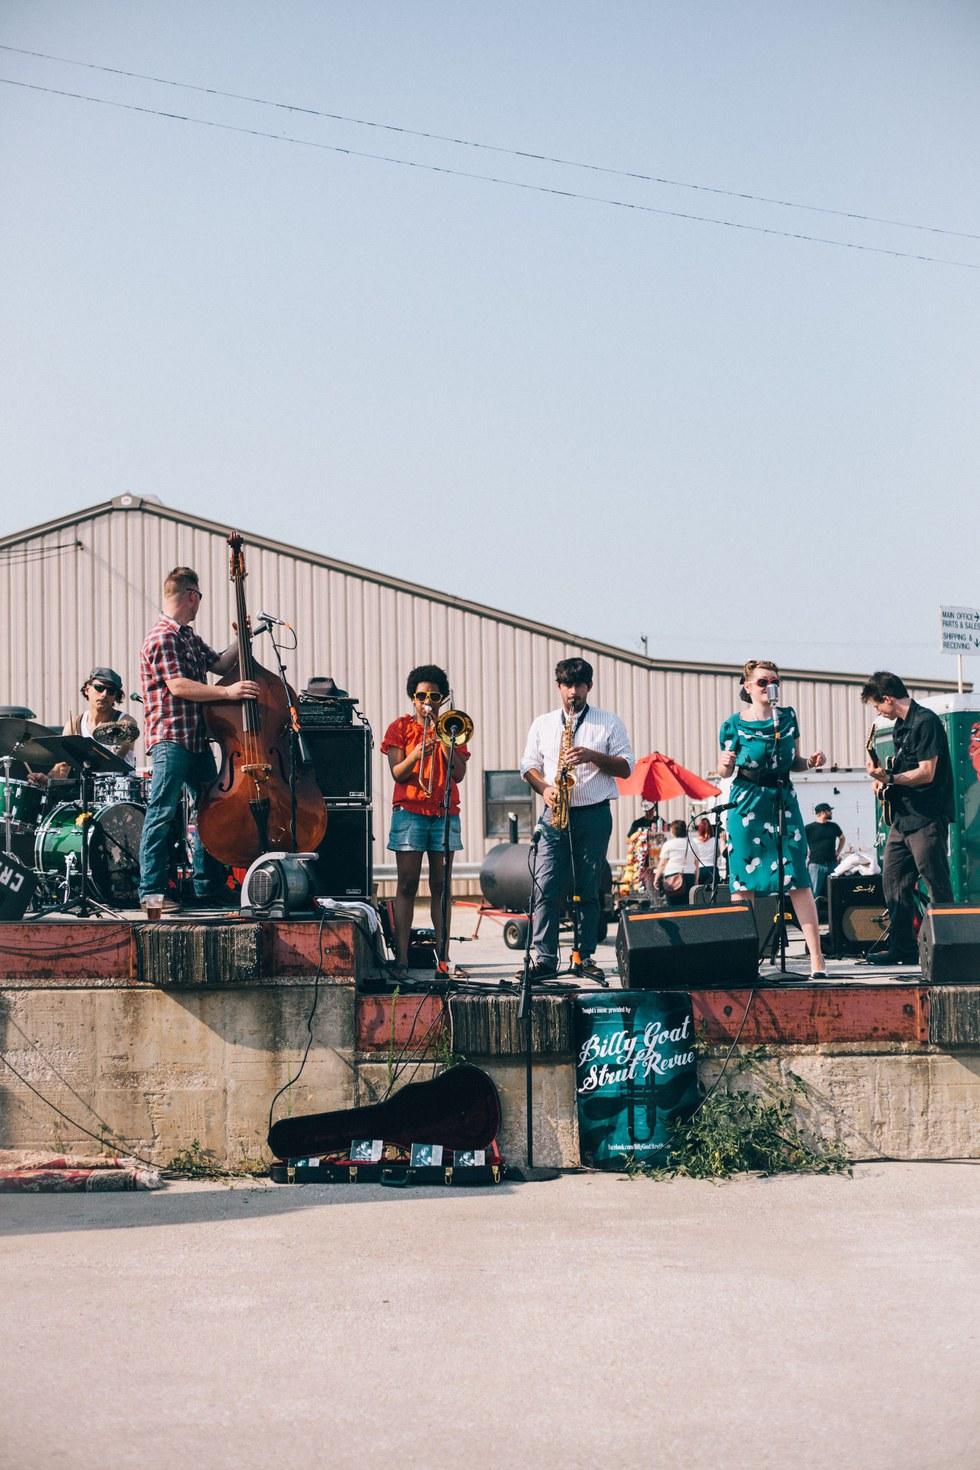 Billy Goat Strut Revue perform at the Flea-Off Market